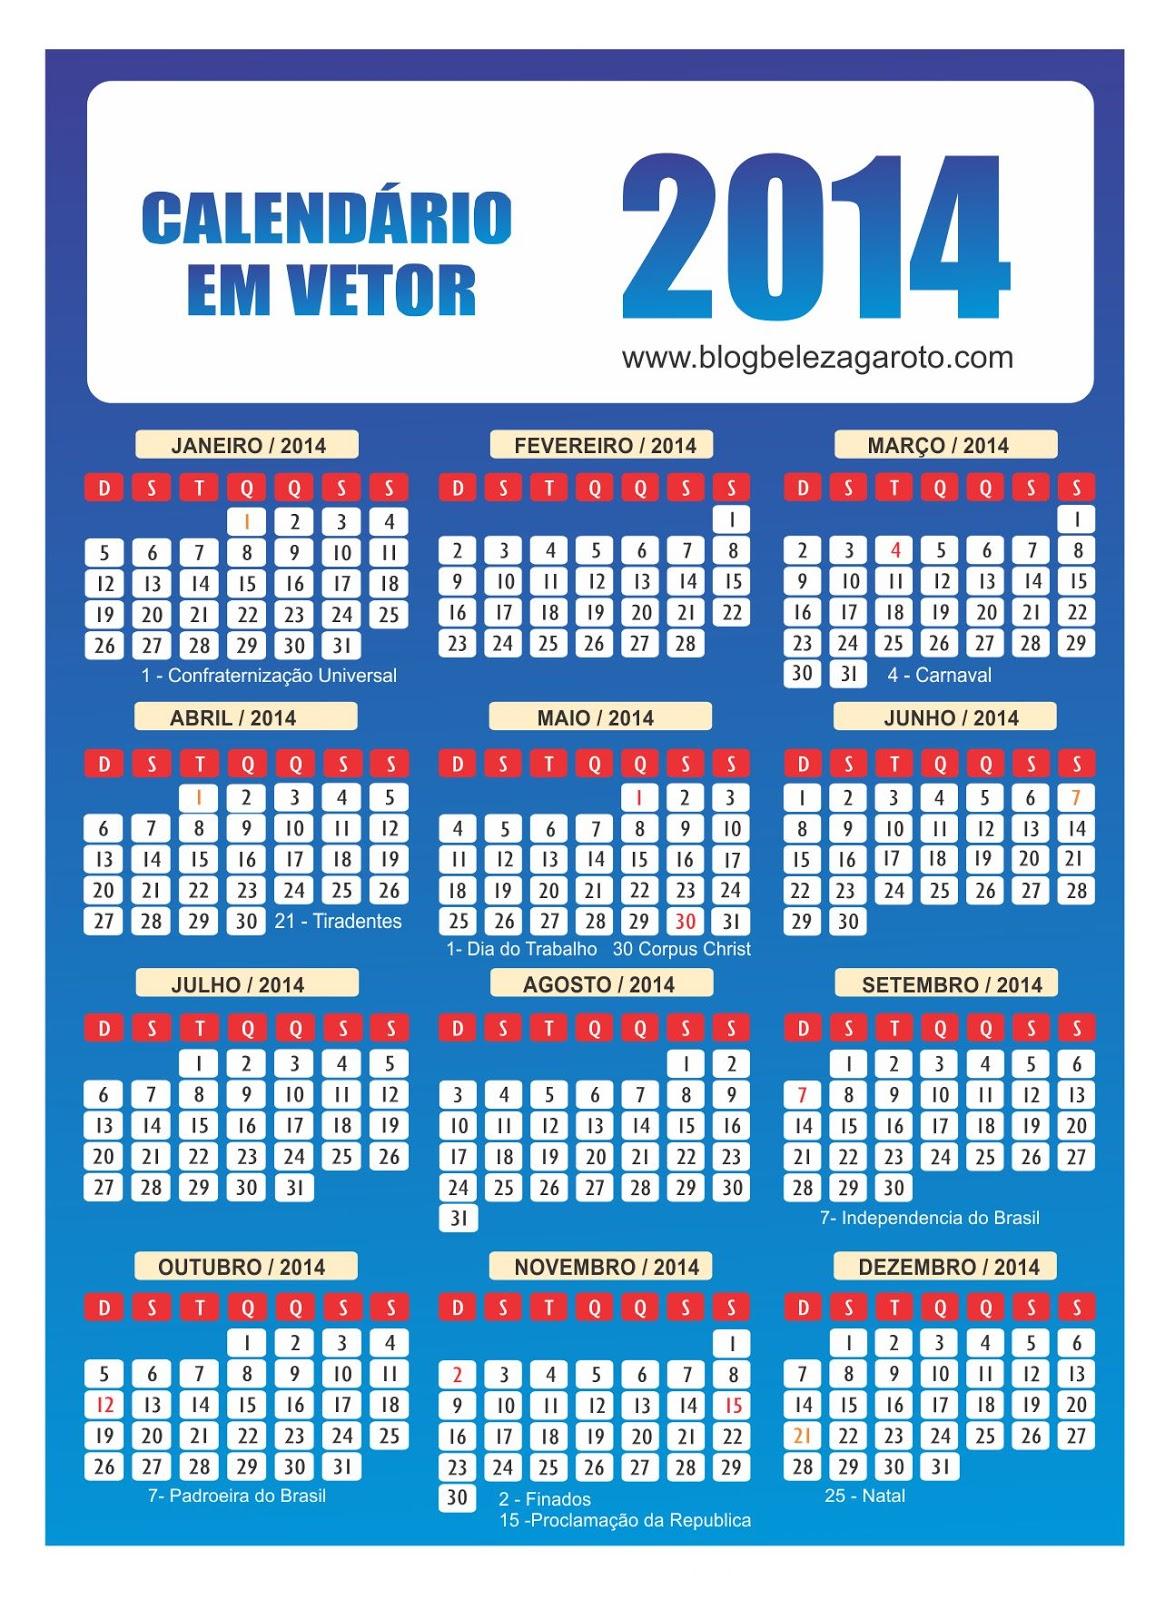 Calendário 2014 Vetor Vector Vetorizado Corel Edítável